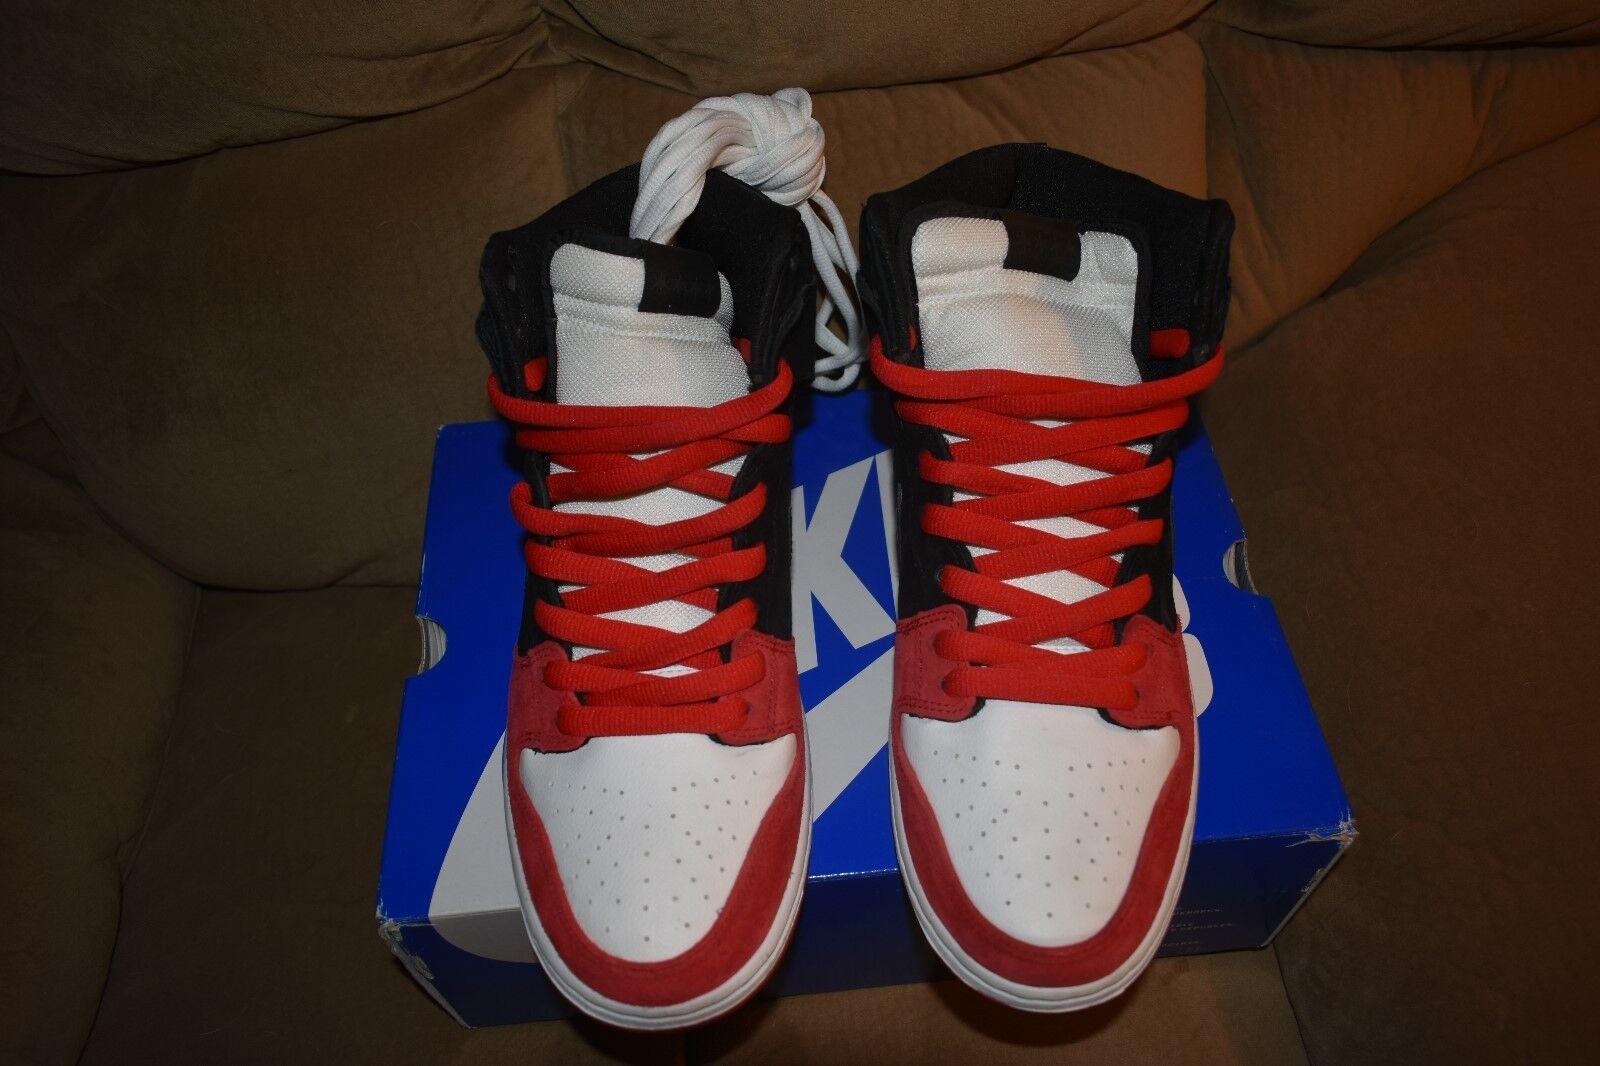 Nike Dunk High Premium SB UPRISE CHICAGO BLACK WHITE RED TOE 313171-061 SZ 11